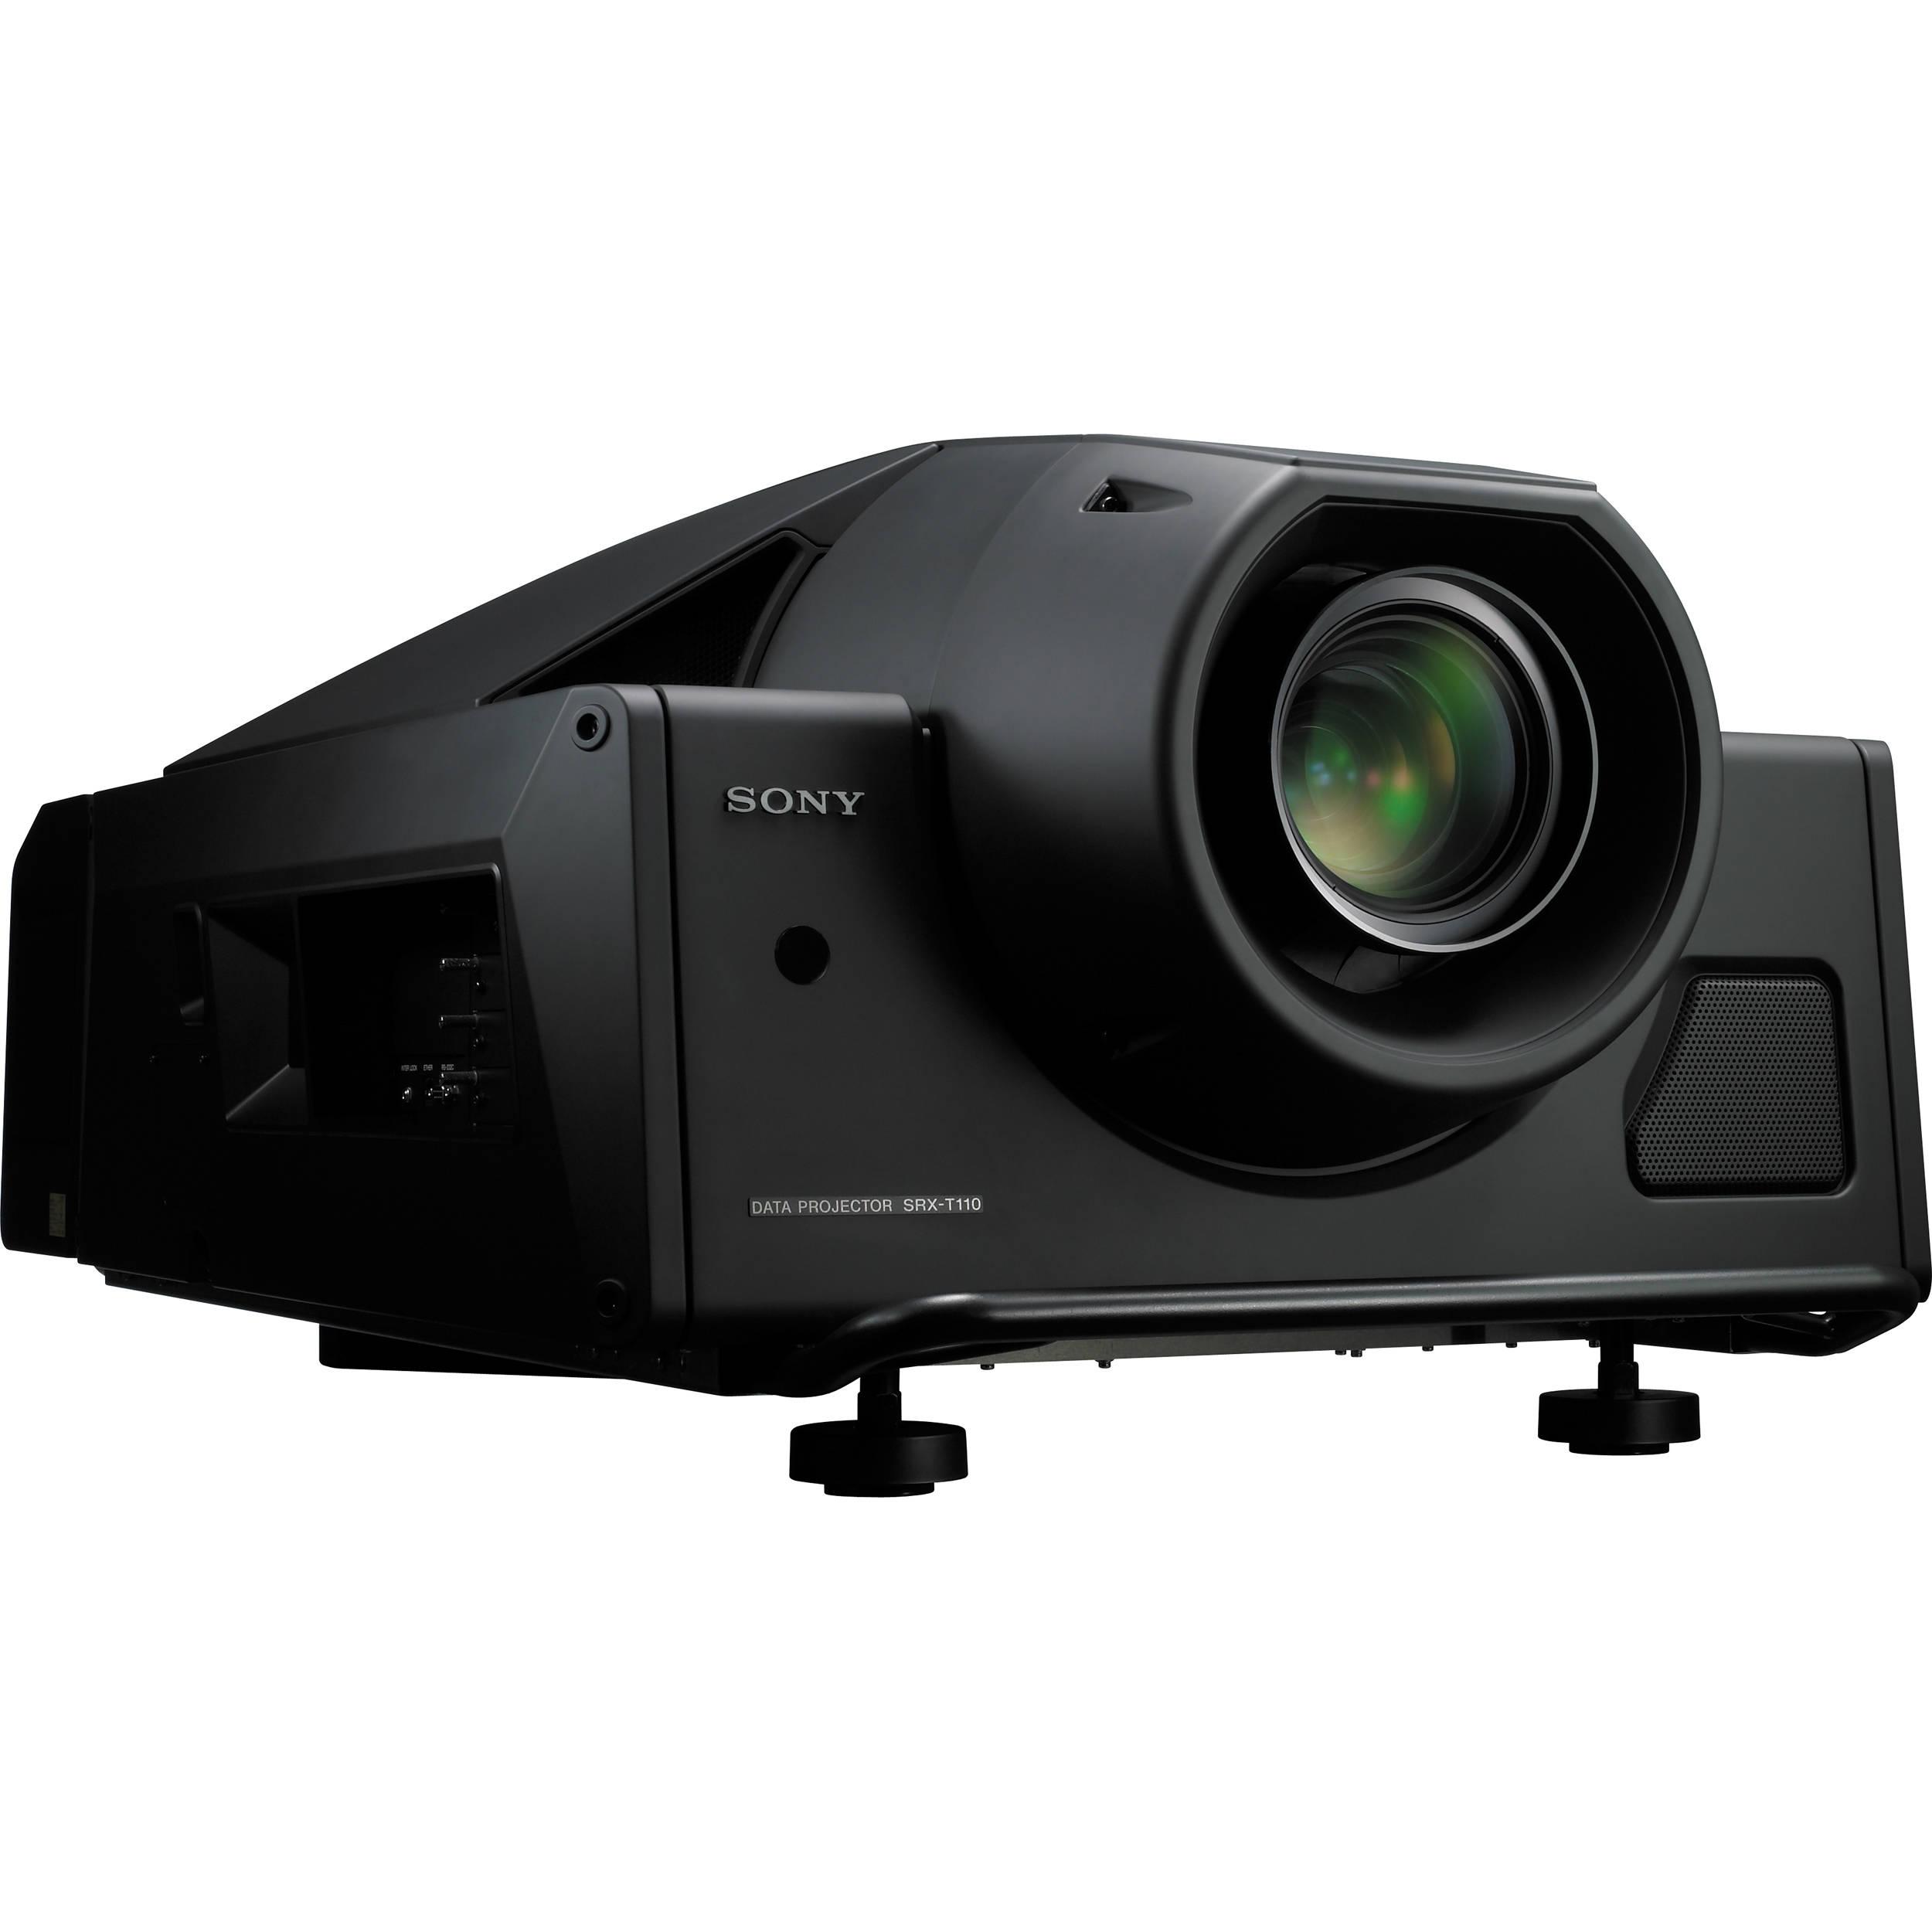 sony srx t110 4k sxrd 11 000 lumen projector srxt110 b h photo rh bhphotovideo com Sony 4K Laser Projector Sony 4K Laser Projector